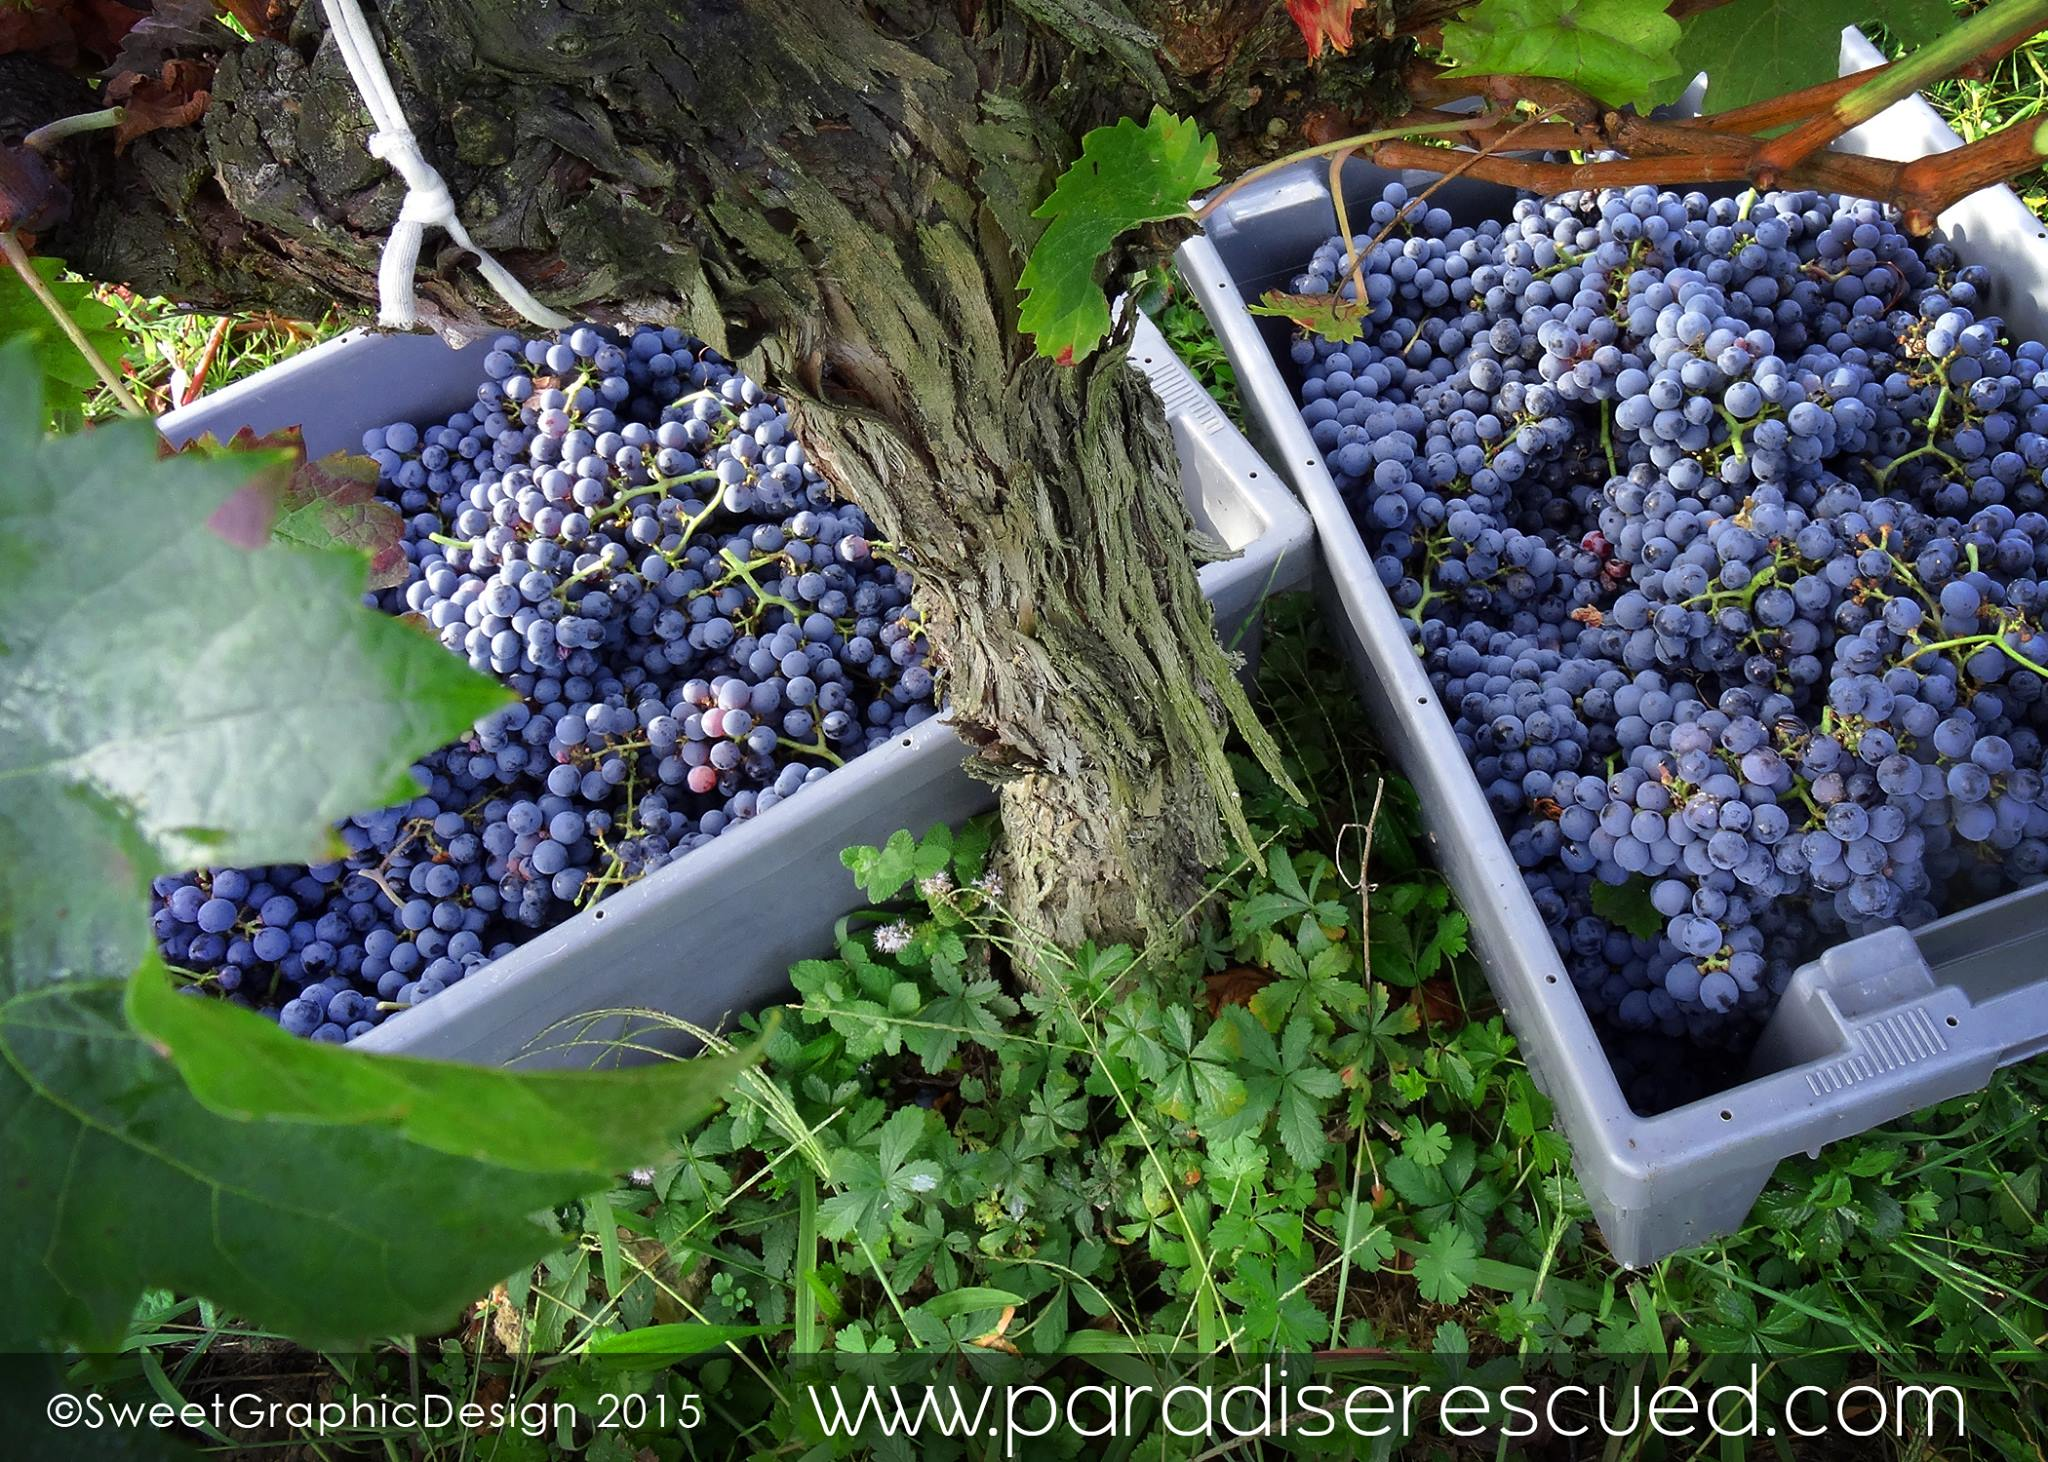 Cabernet Franc fruit Paradise Rescued